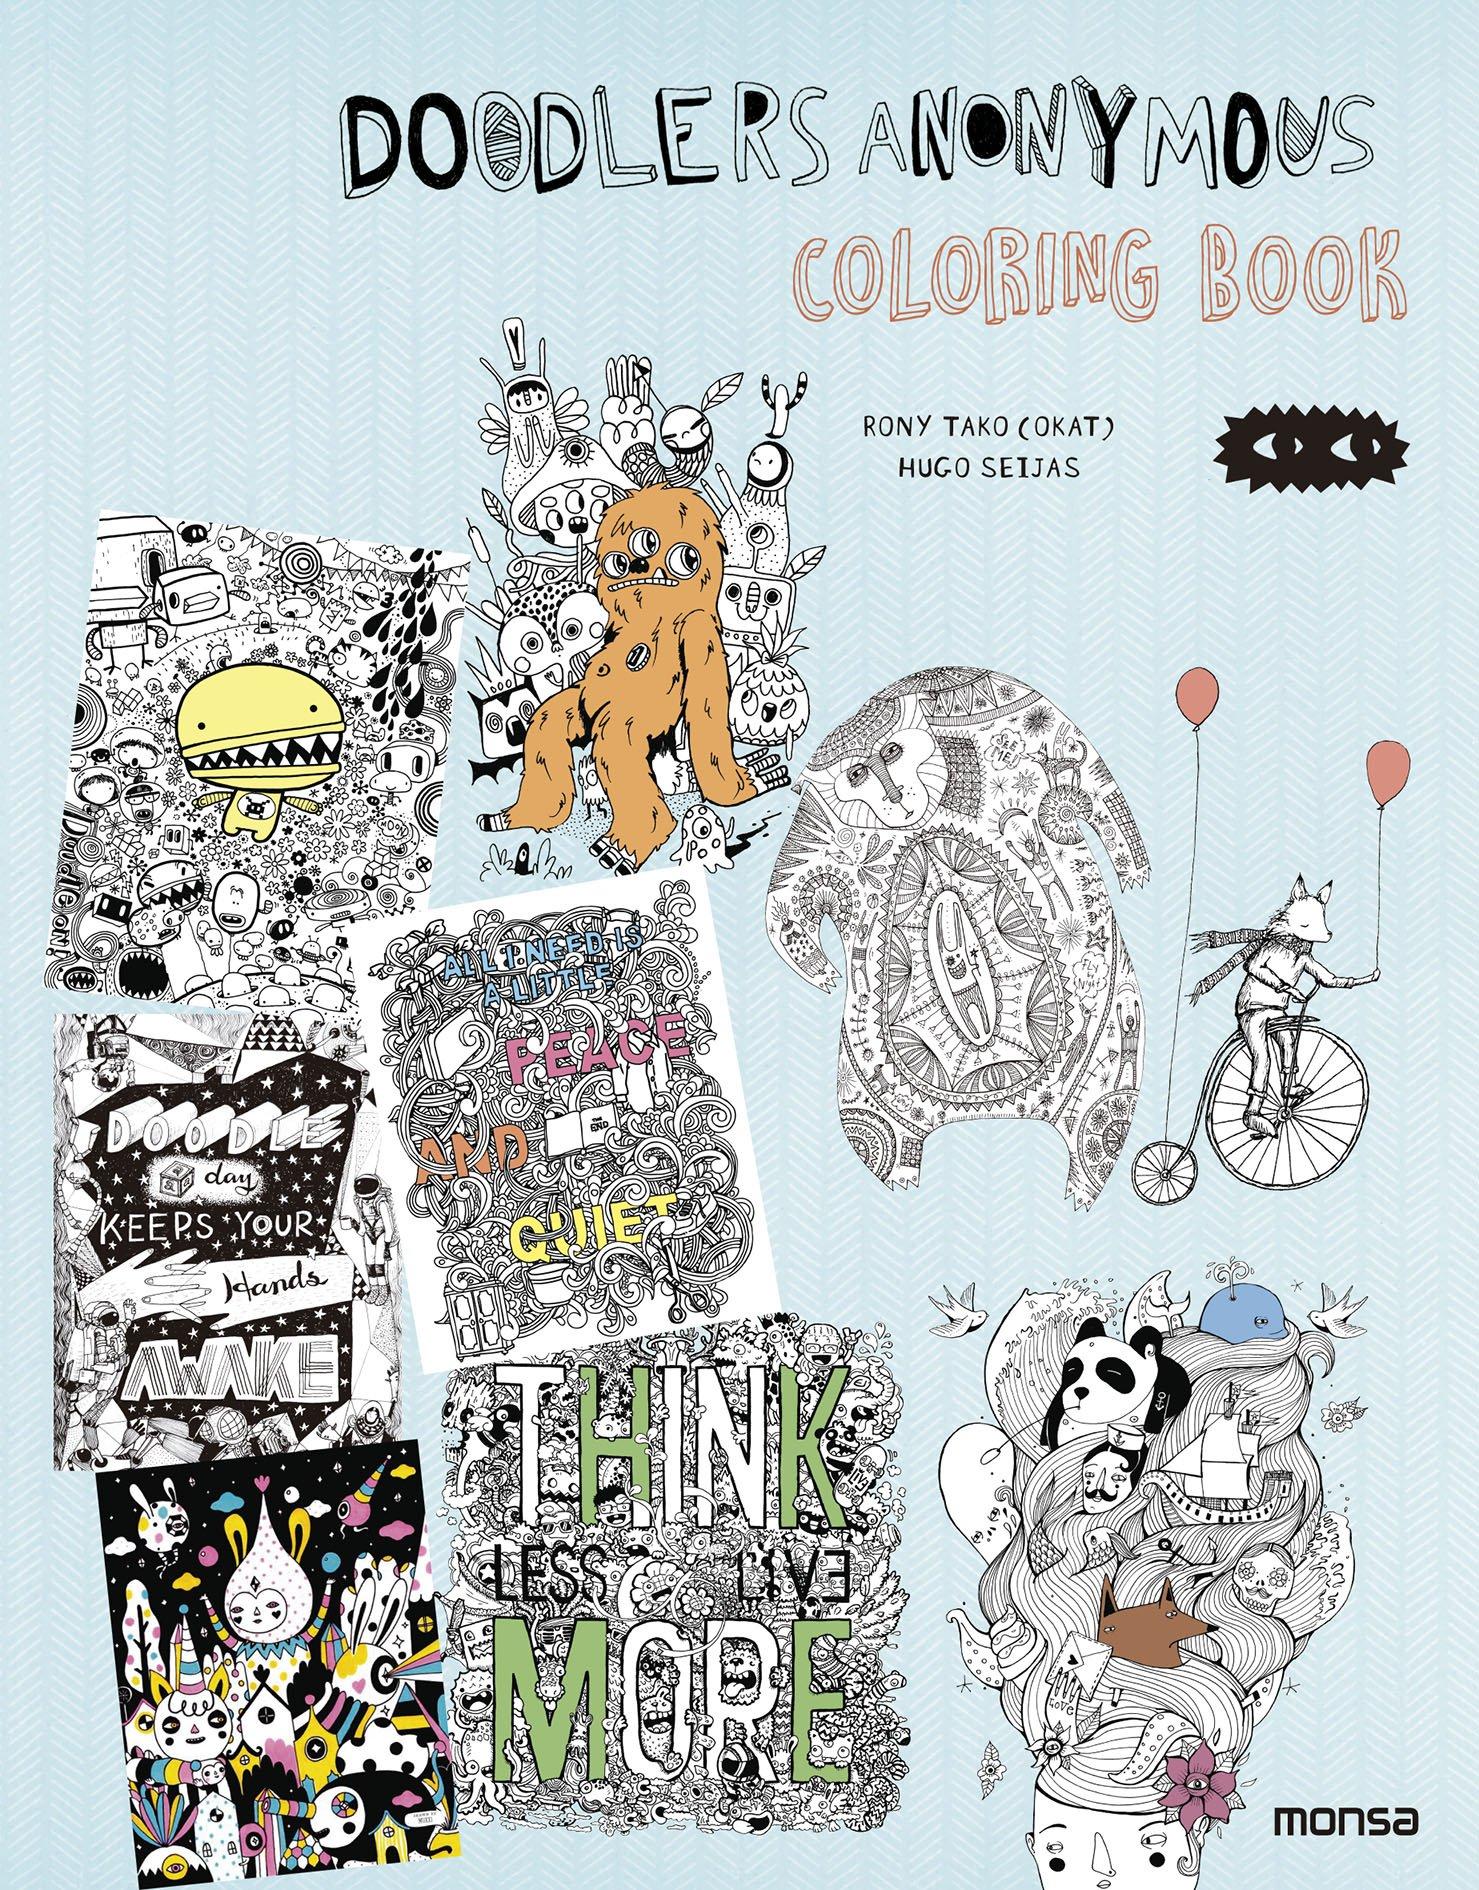 Doodlers Anonymous. Coloring book (Colouring Books) Tapa blanda – 1 abr 2016 rony tako hugo seijas Instituto Monsa de Ediciones S.A.